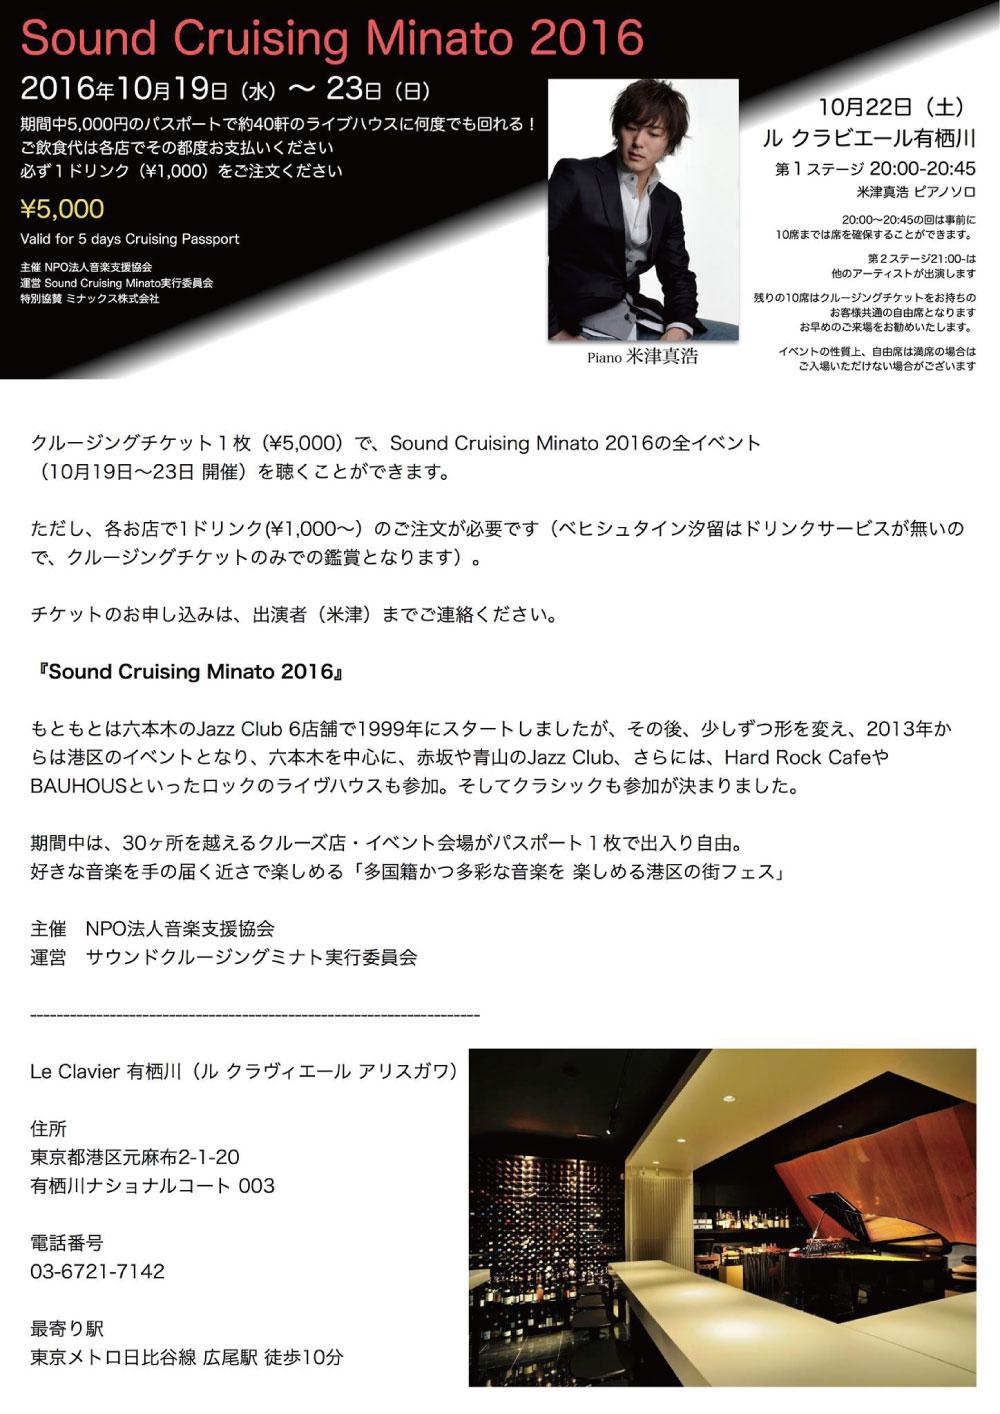 2016年10月19-23日 Sound Cruising Minato 2016